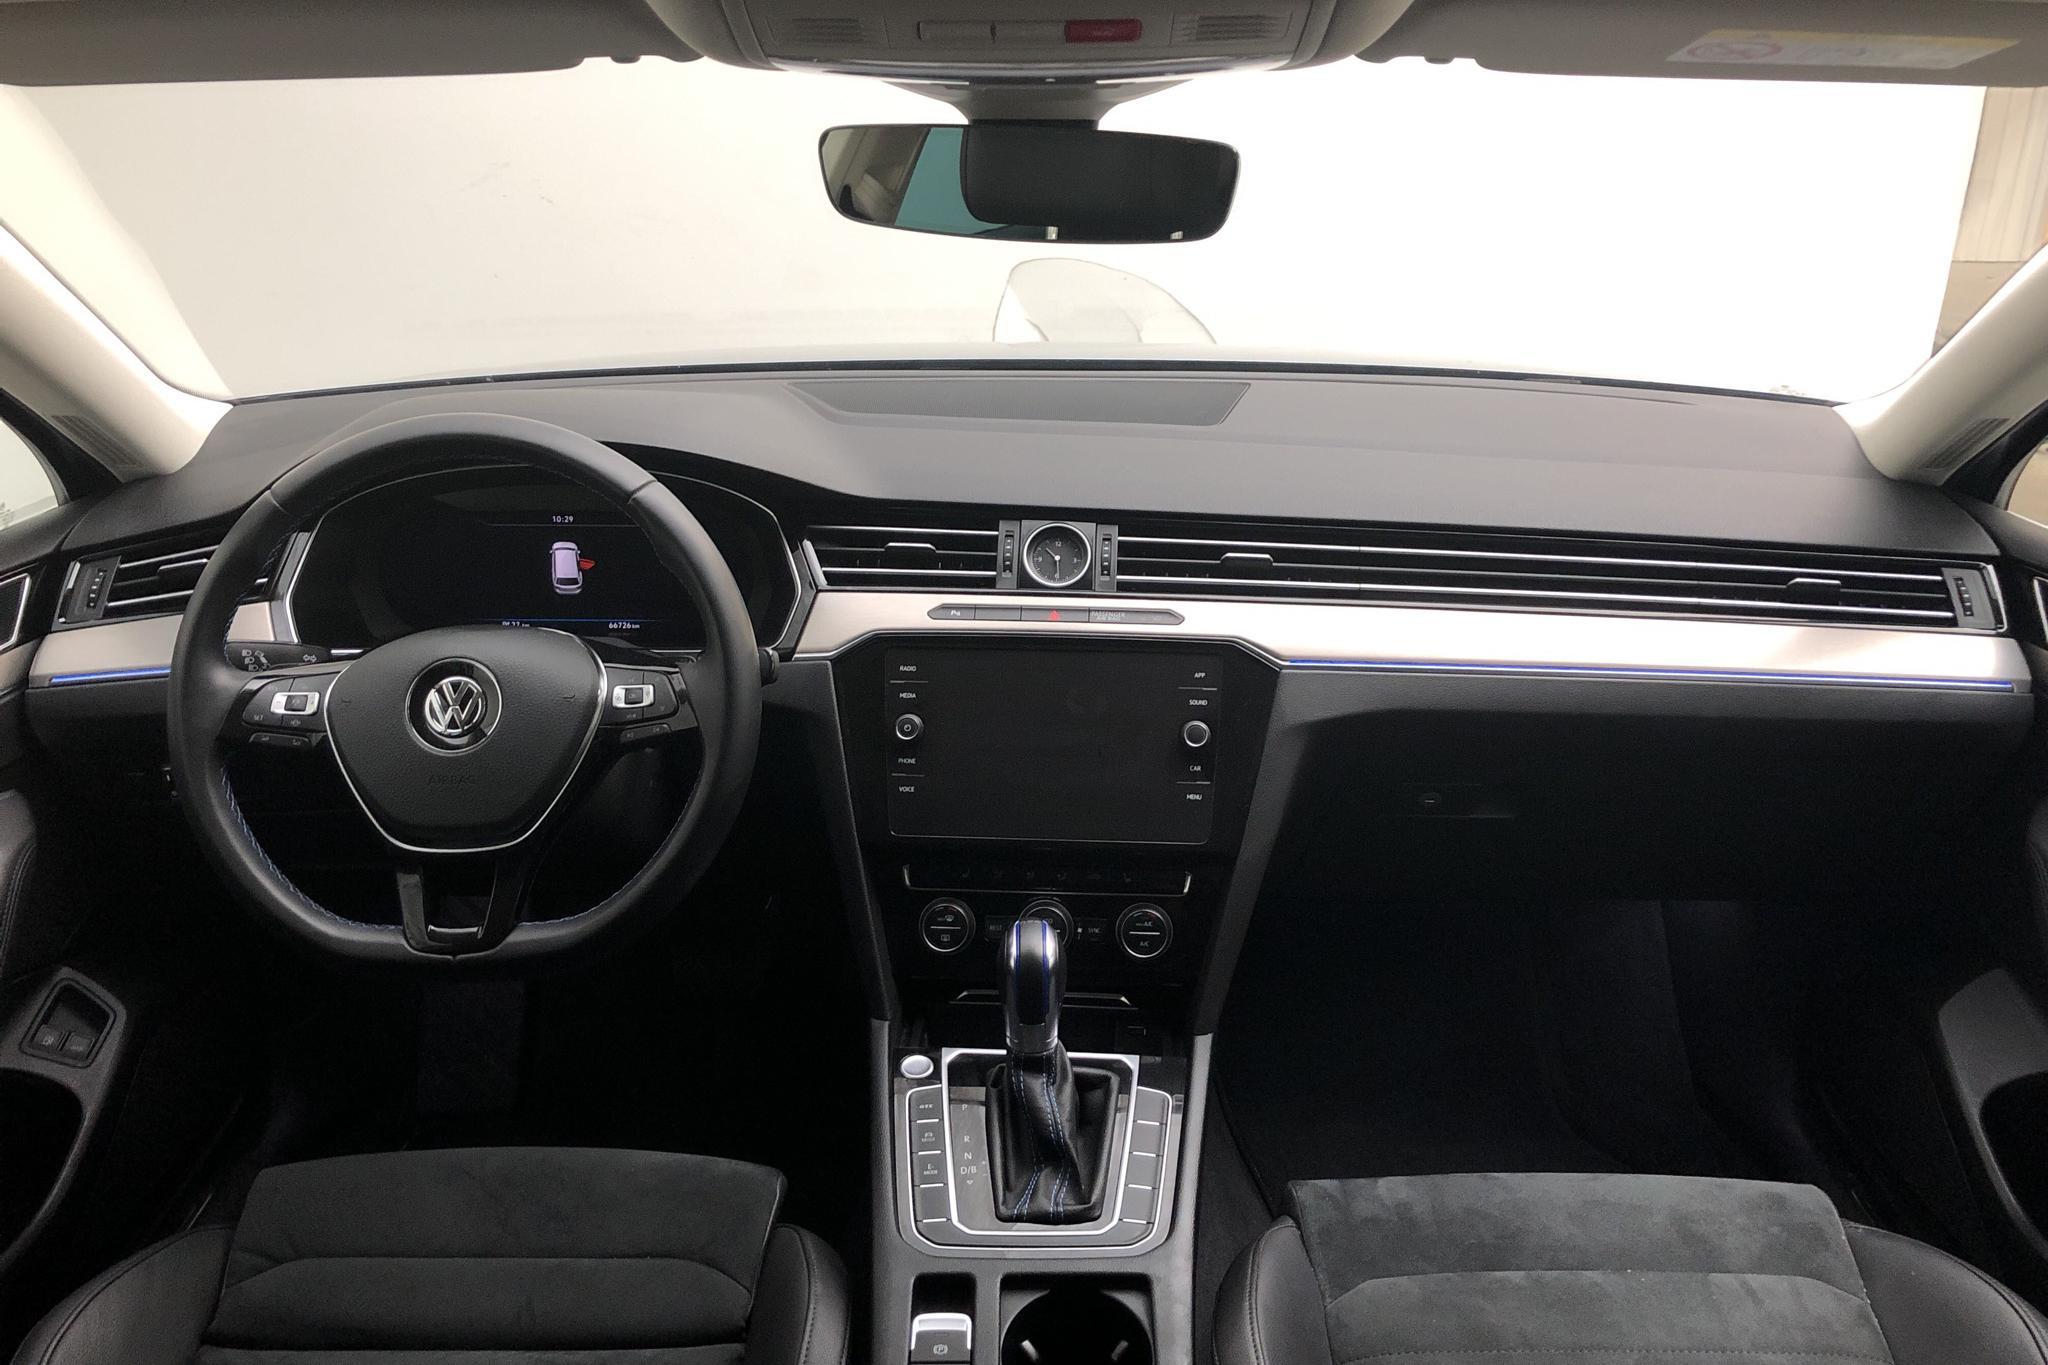 VW Passat 1.4 Plug-in-Hybrid Sportscombi (218hk) - 6 673 mil - Automat - silver - 2019